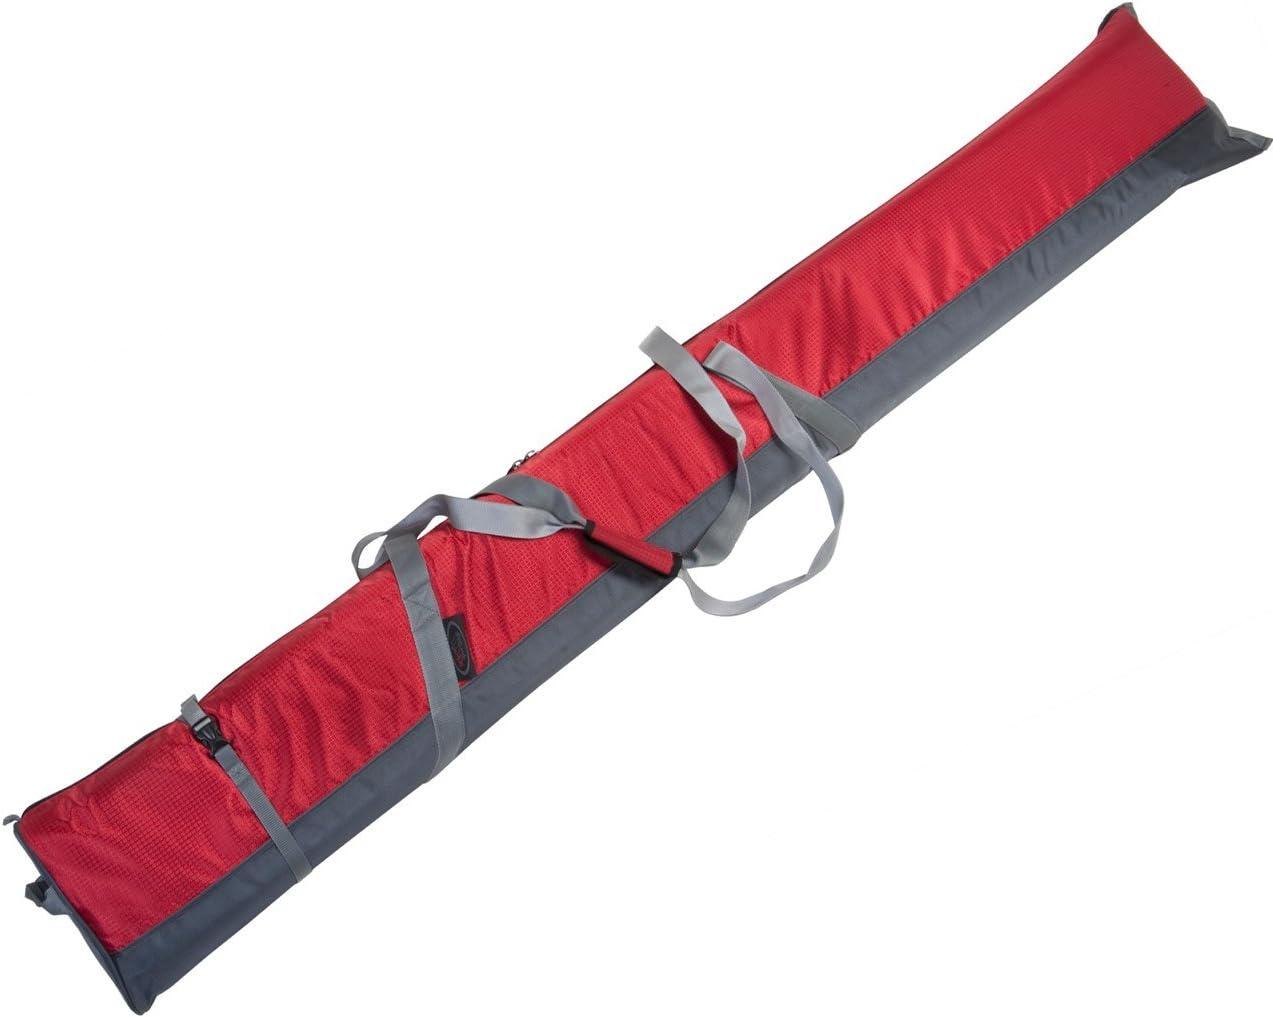 Single SKI BAG half - Fully Padded T0 up Skis Fits 170cm SALENEW very popular